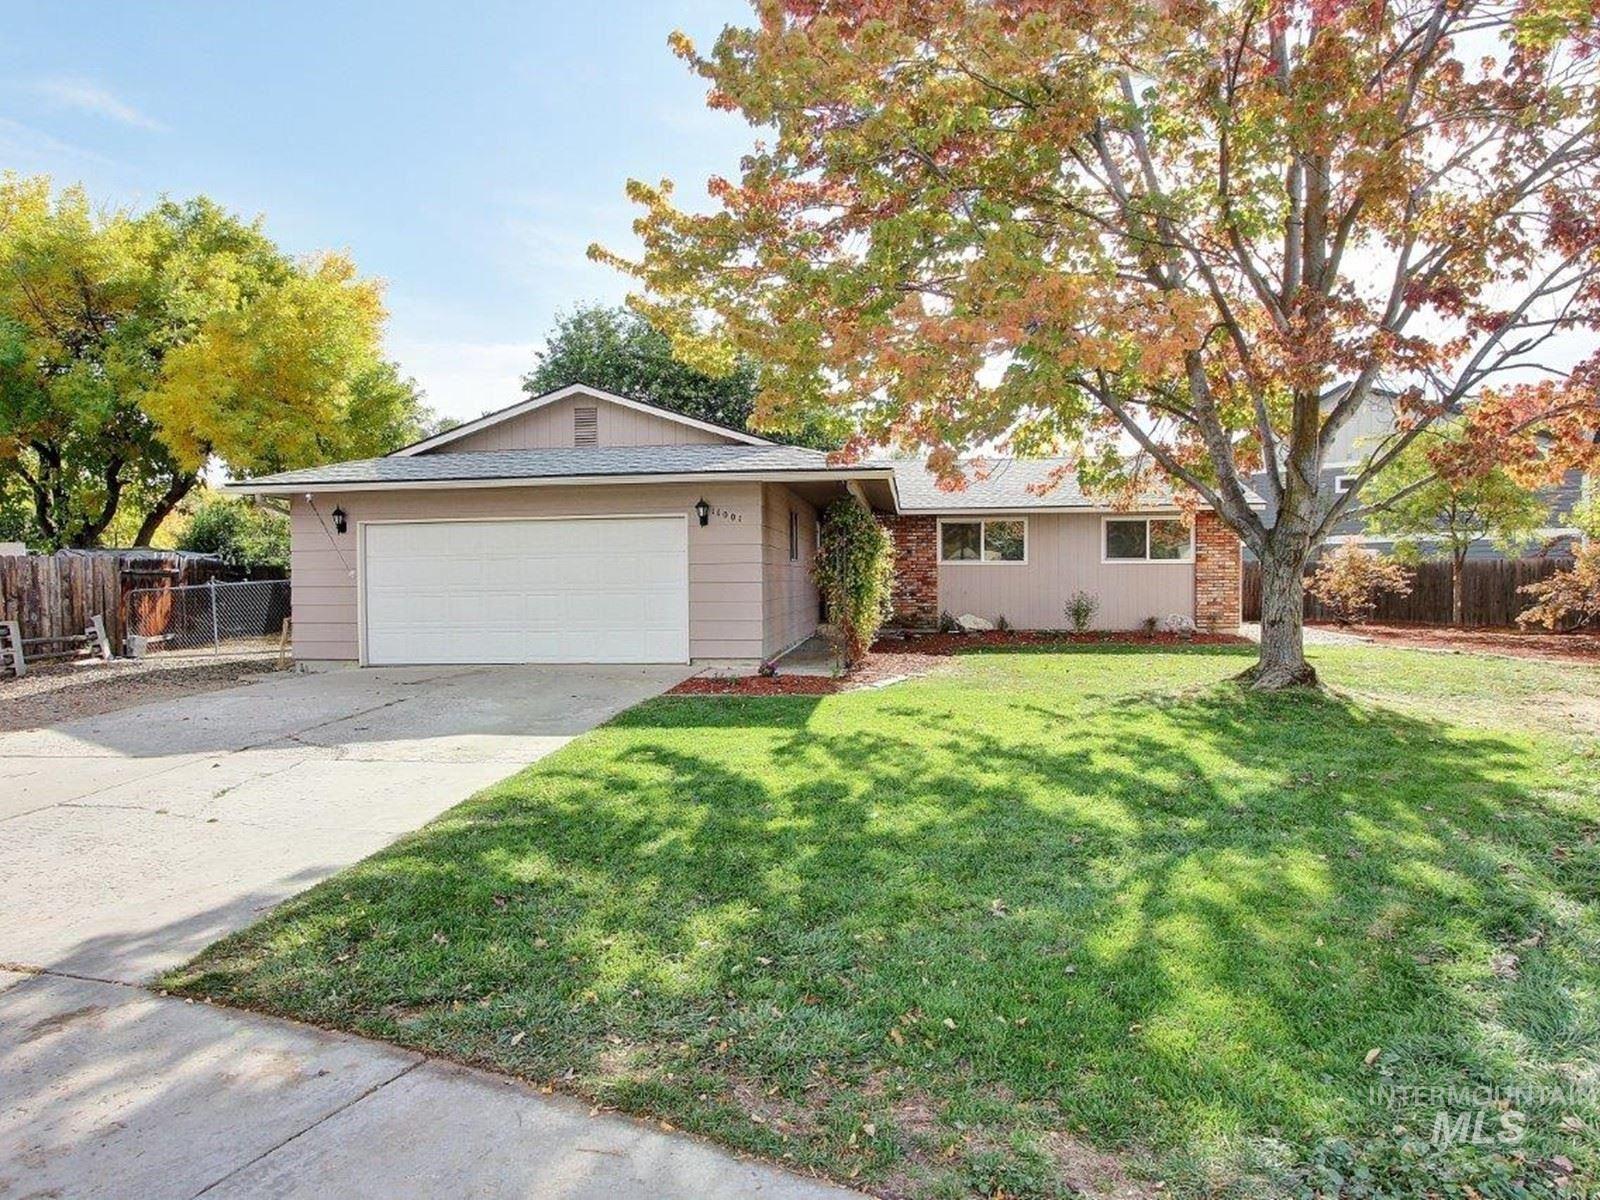 Photo of 11001 W Wampum Dr, Boise, ID 83713 (MLS # 98784661)